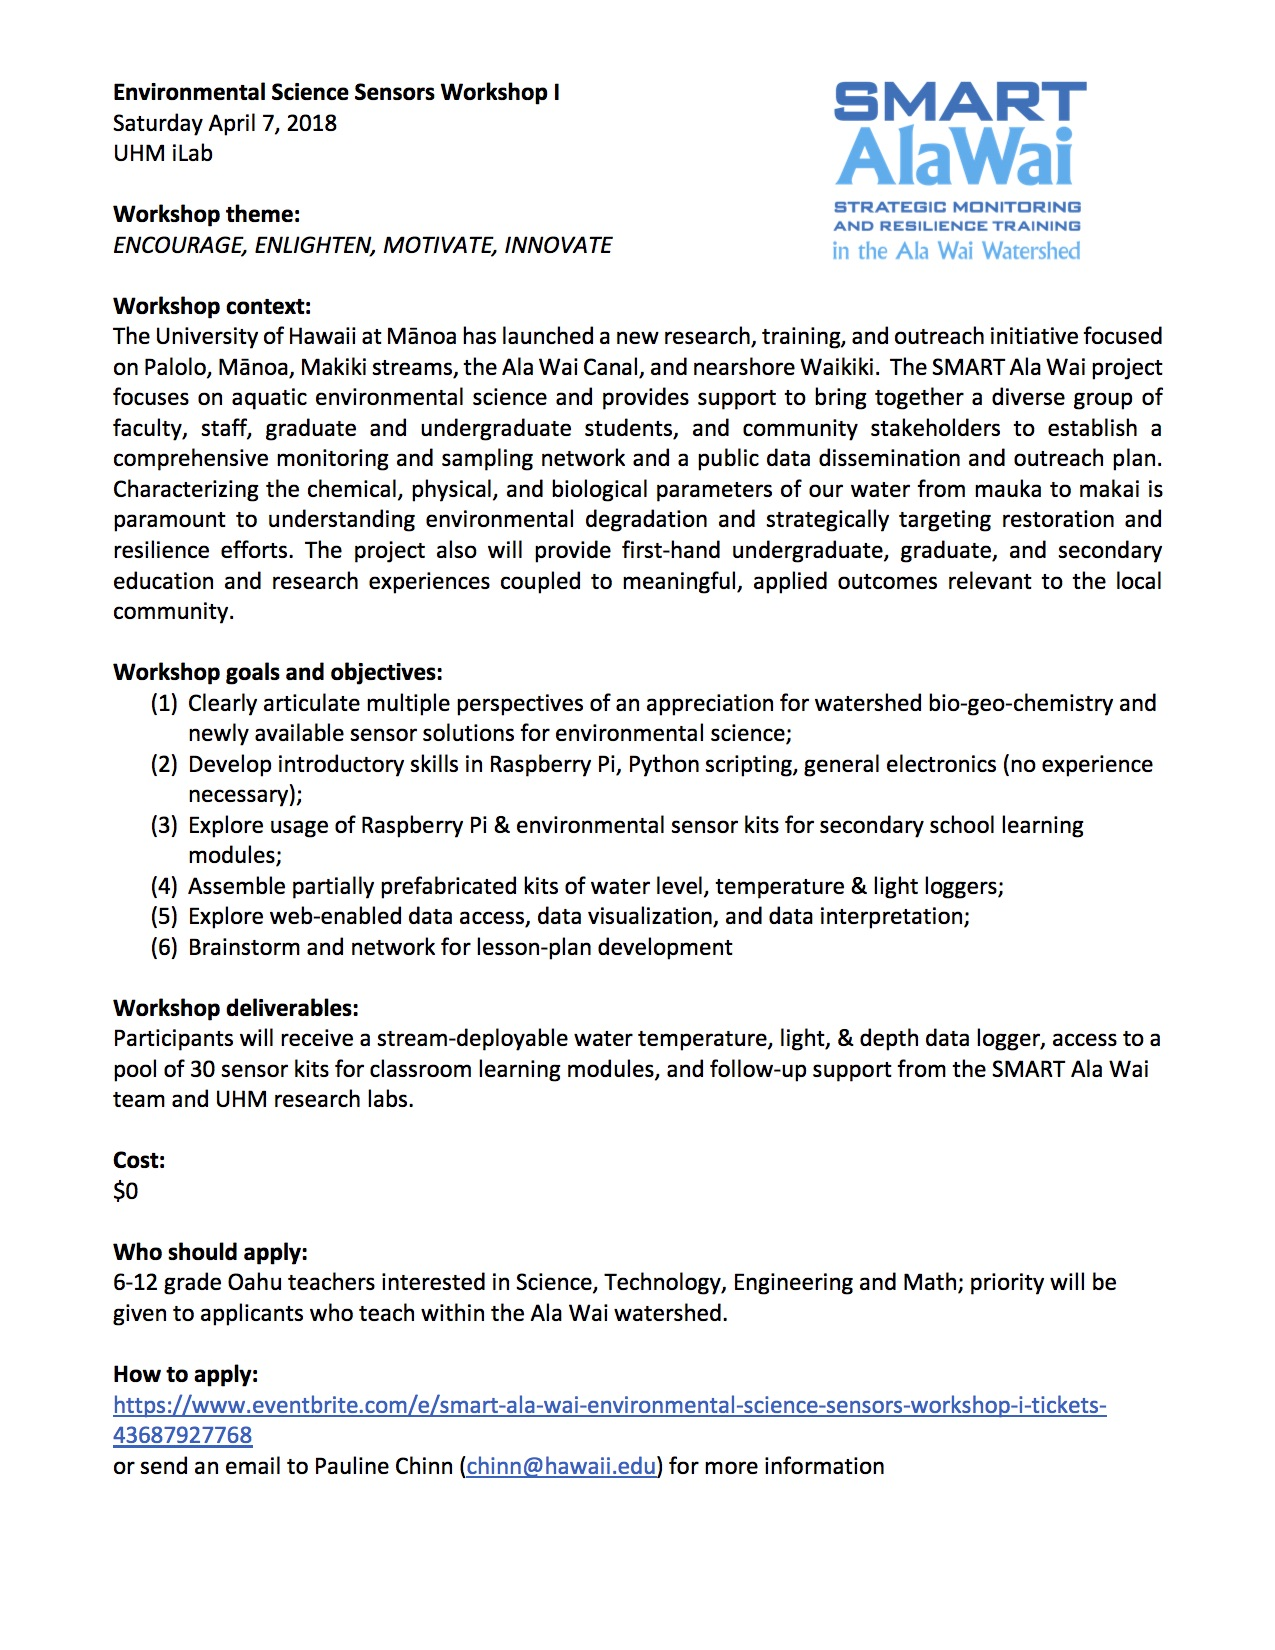 SMART_AlaWai_Workshop01_flyer.jpg